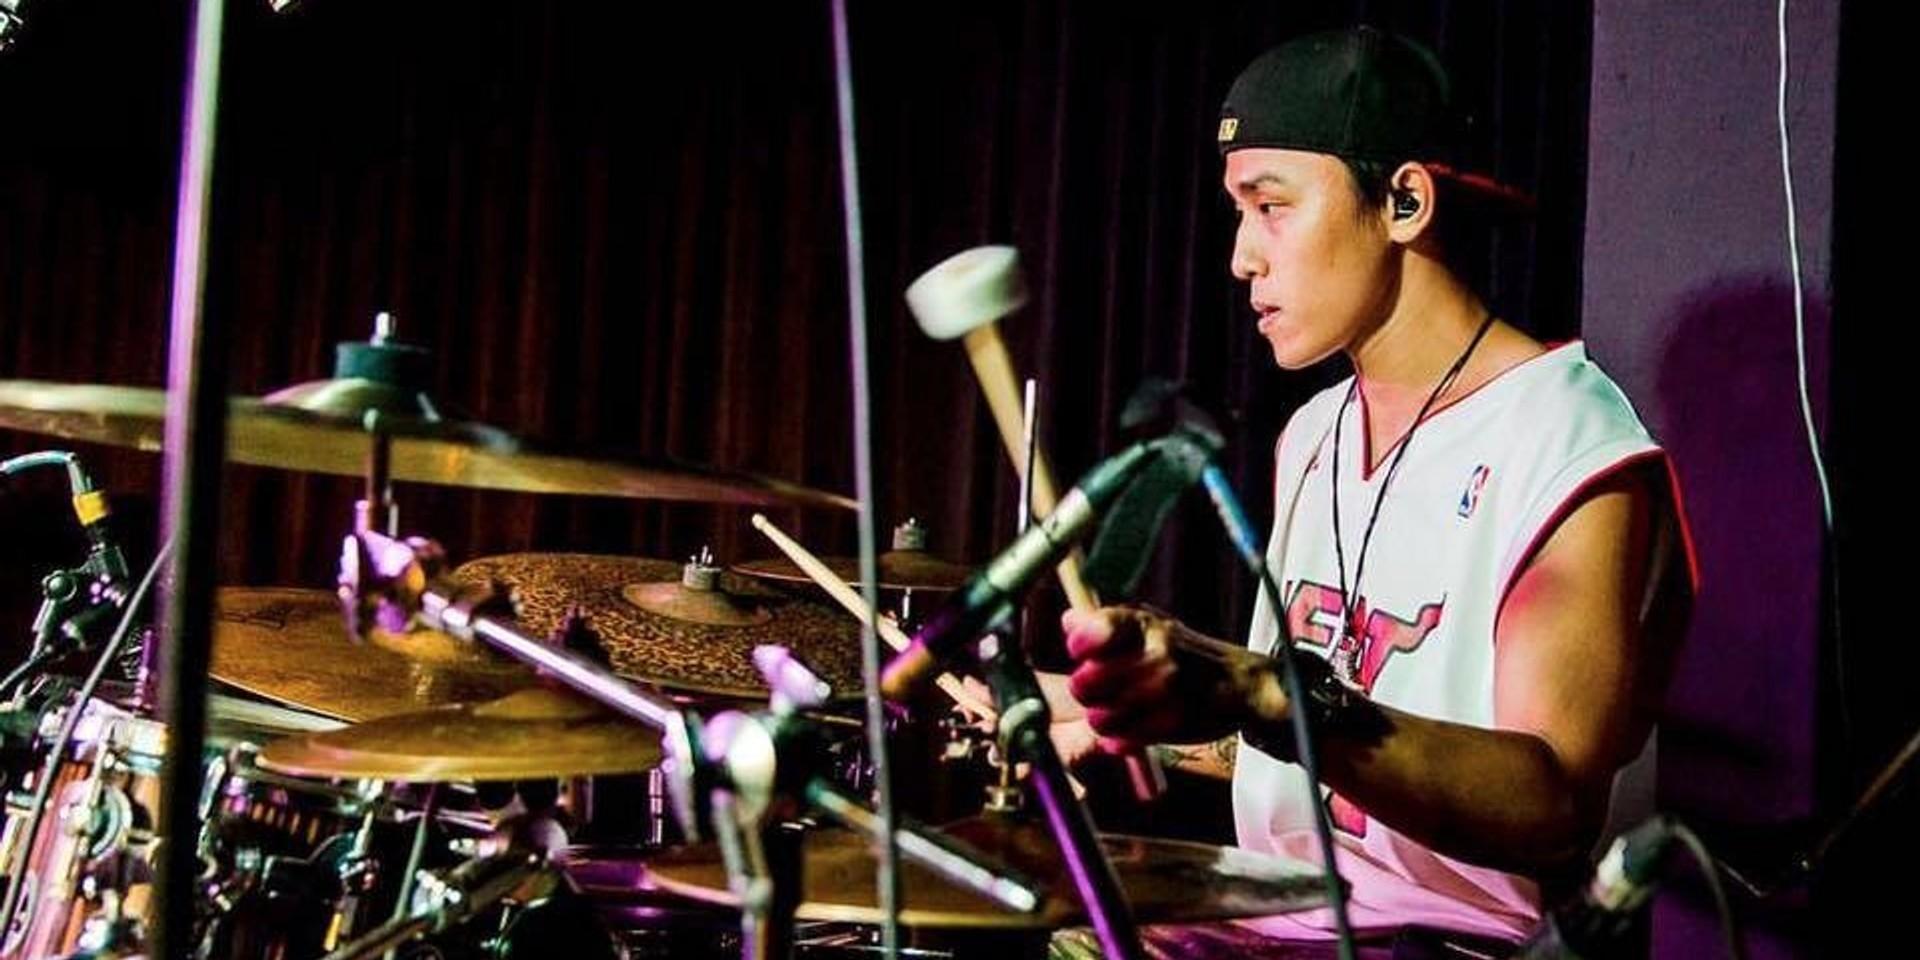 Ultimate Drummers Weekend 2017 presents virtuoso performances, masterclasses and drum battles